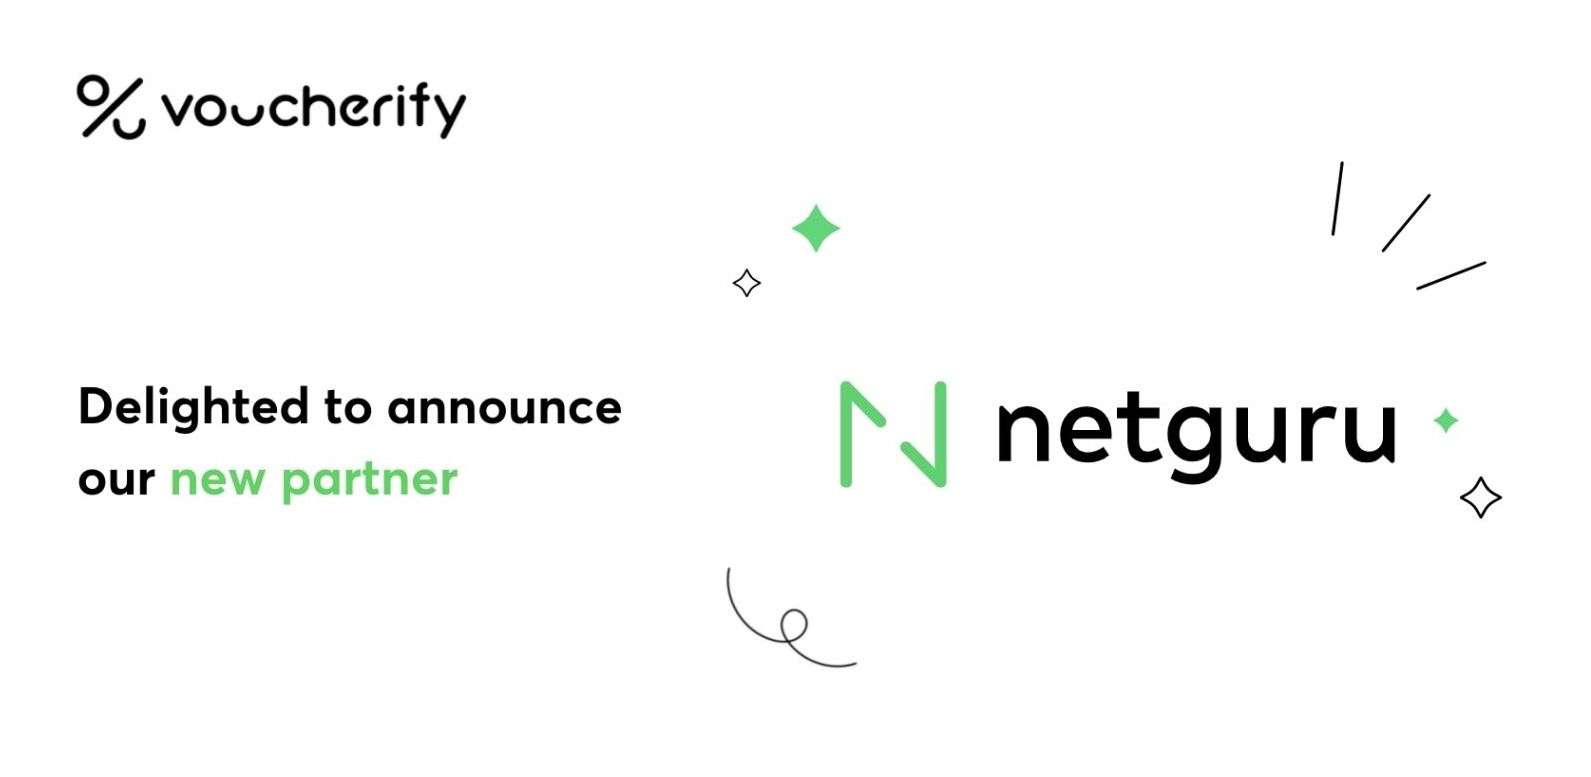 Voucherify starts partnership with Netguru